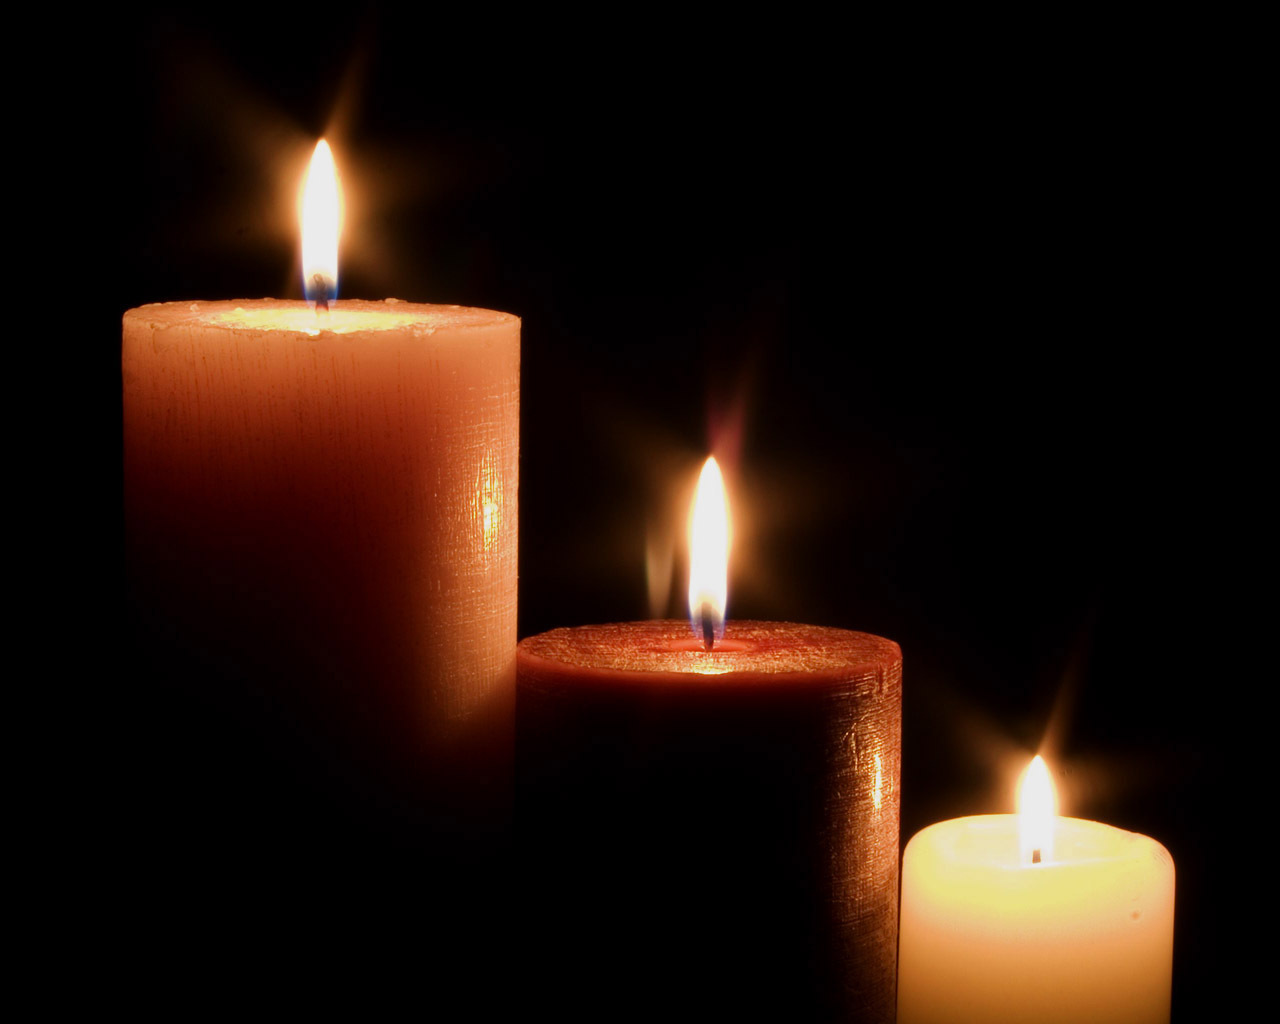 Candle wallpaper - Candles Wallpaper (4091186) - Fanpop